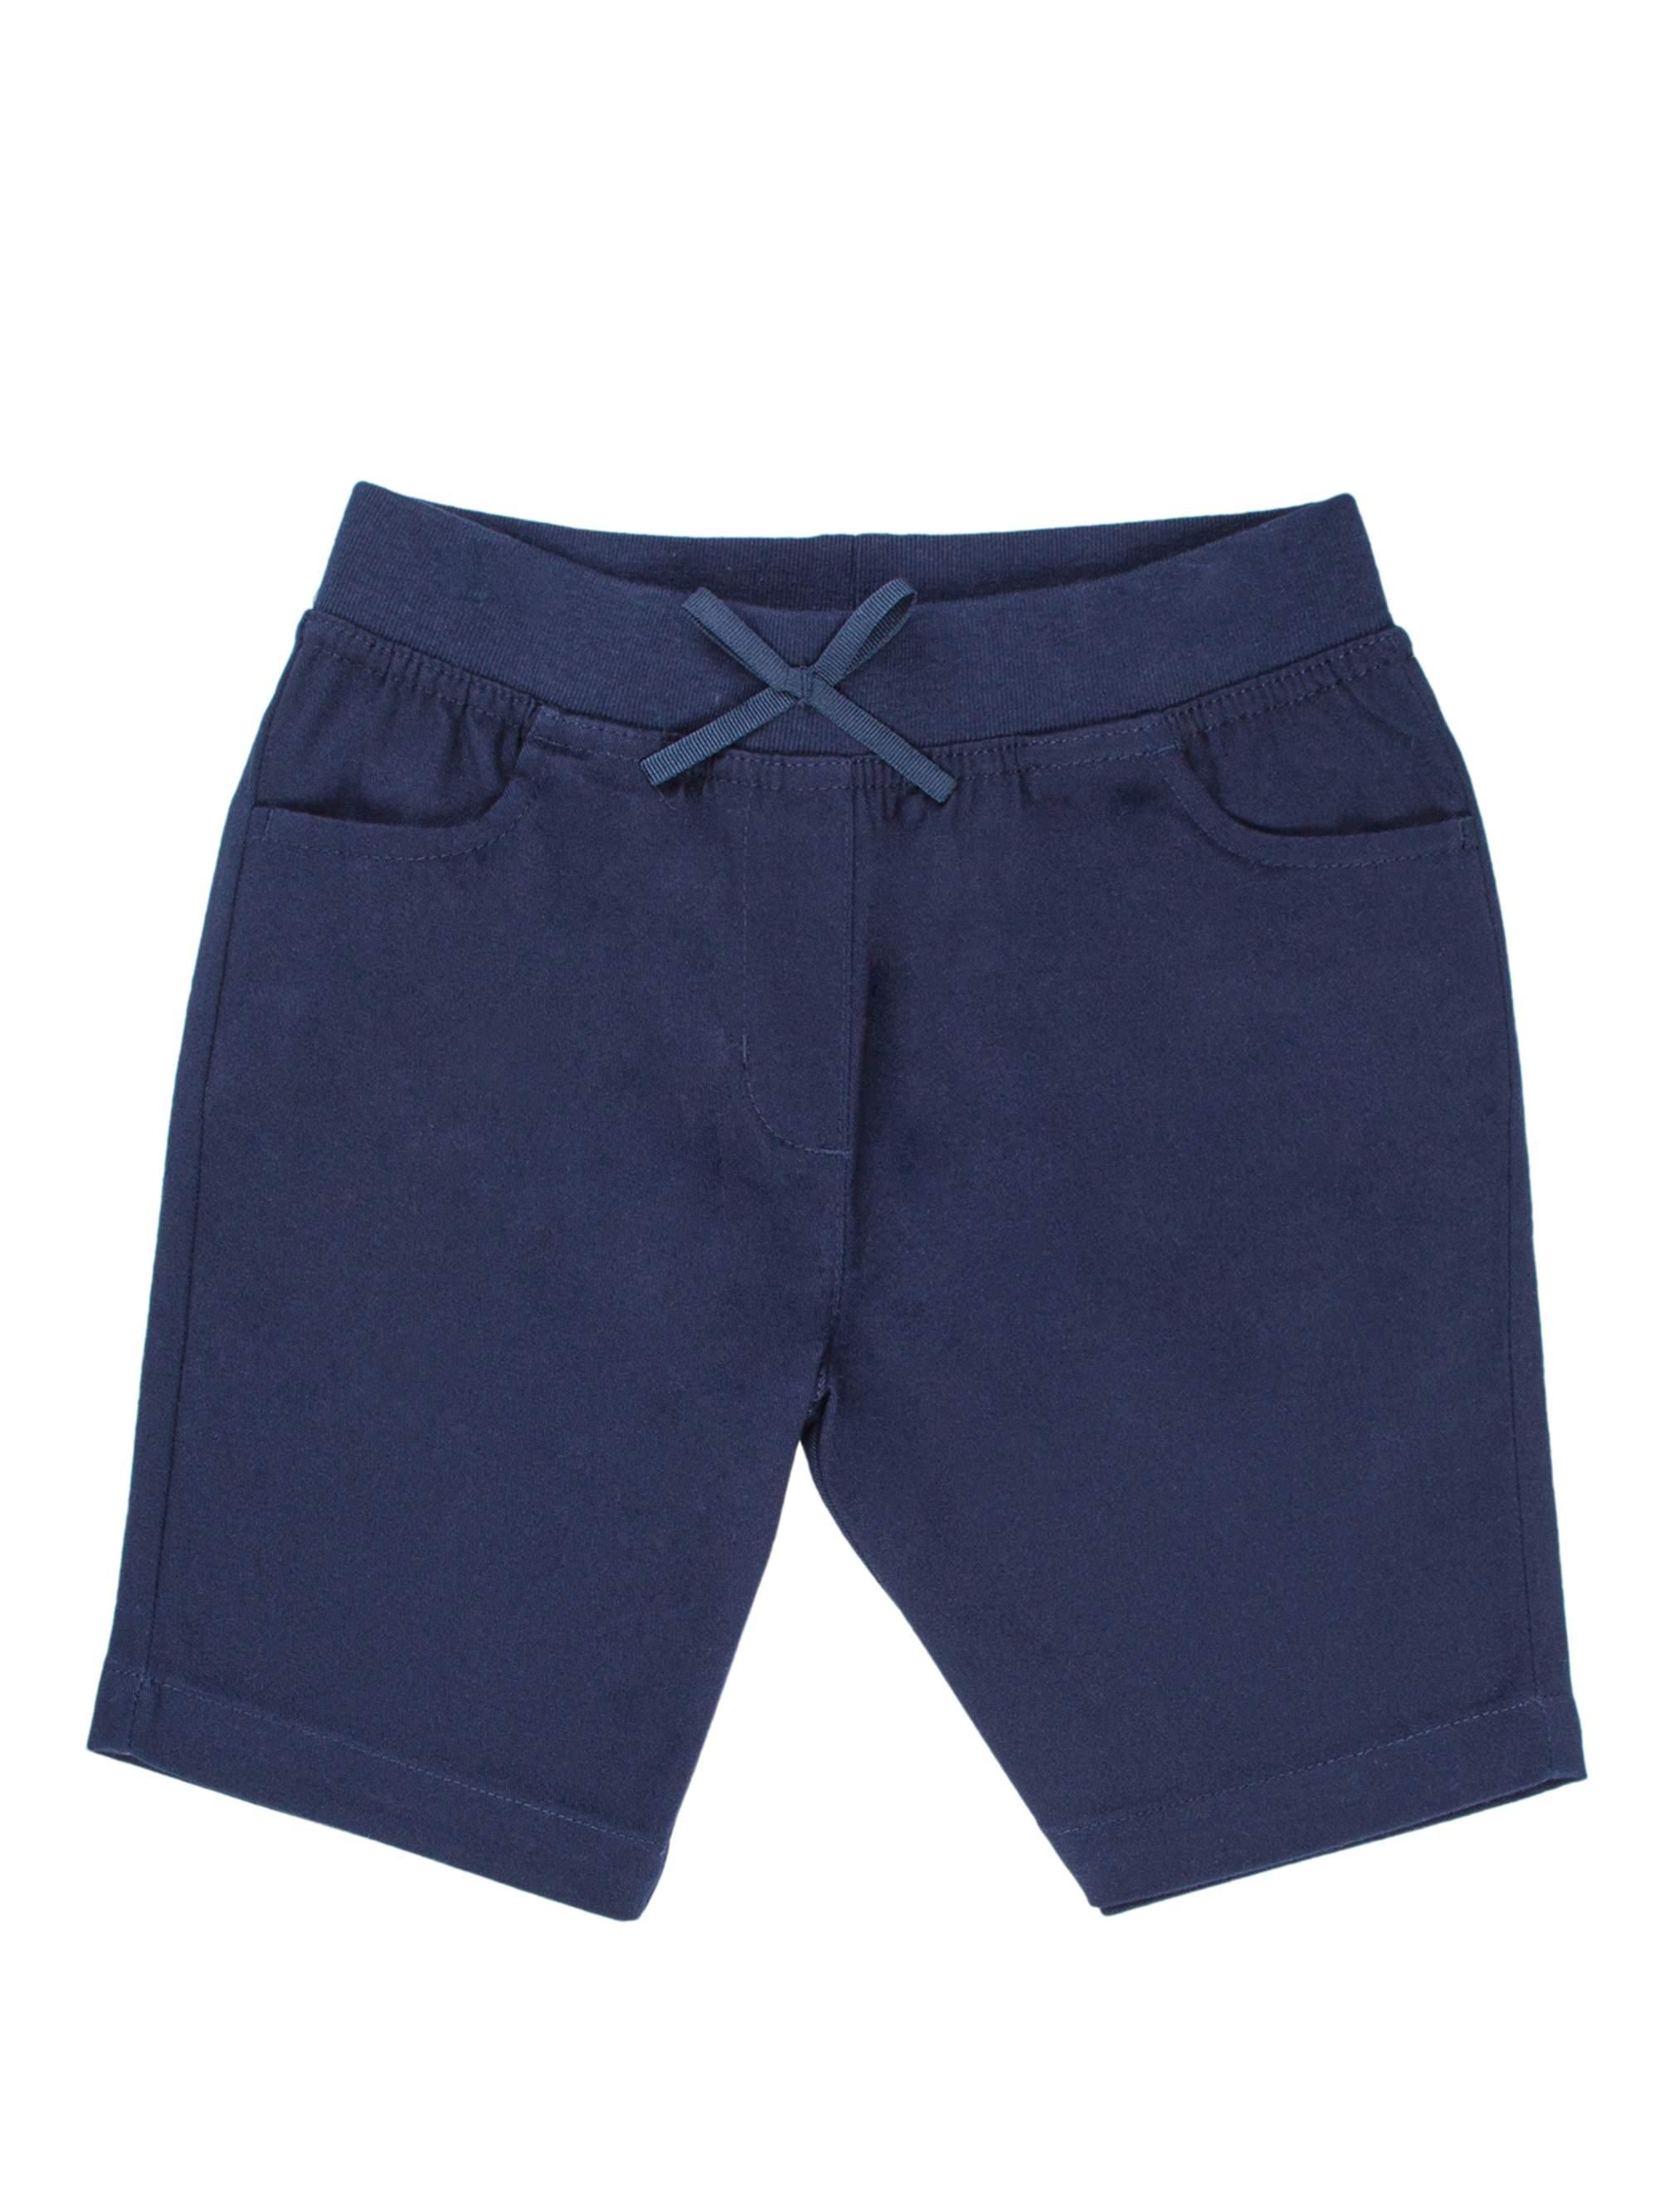 Toddler Girls School Uniform Pull-On Shorts